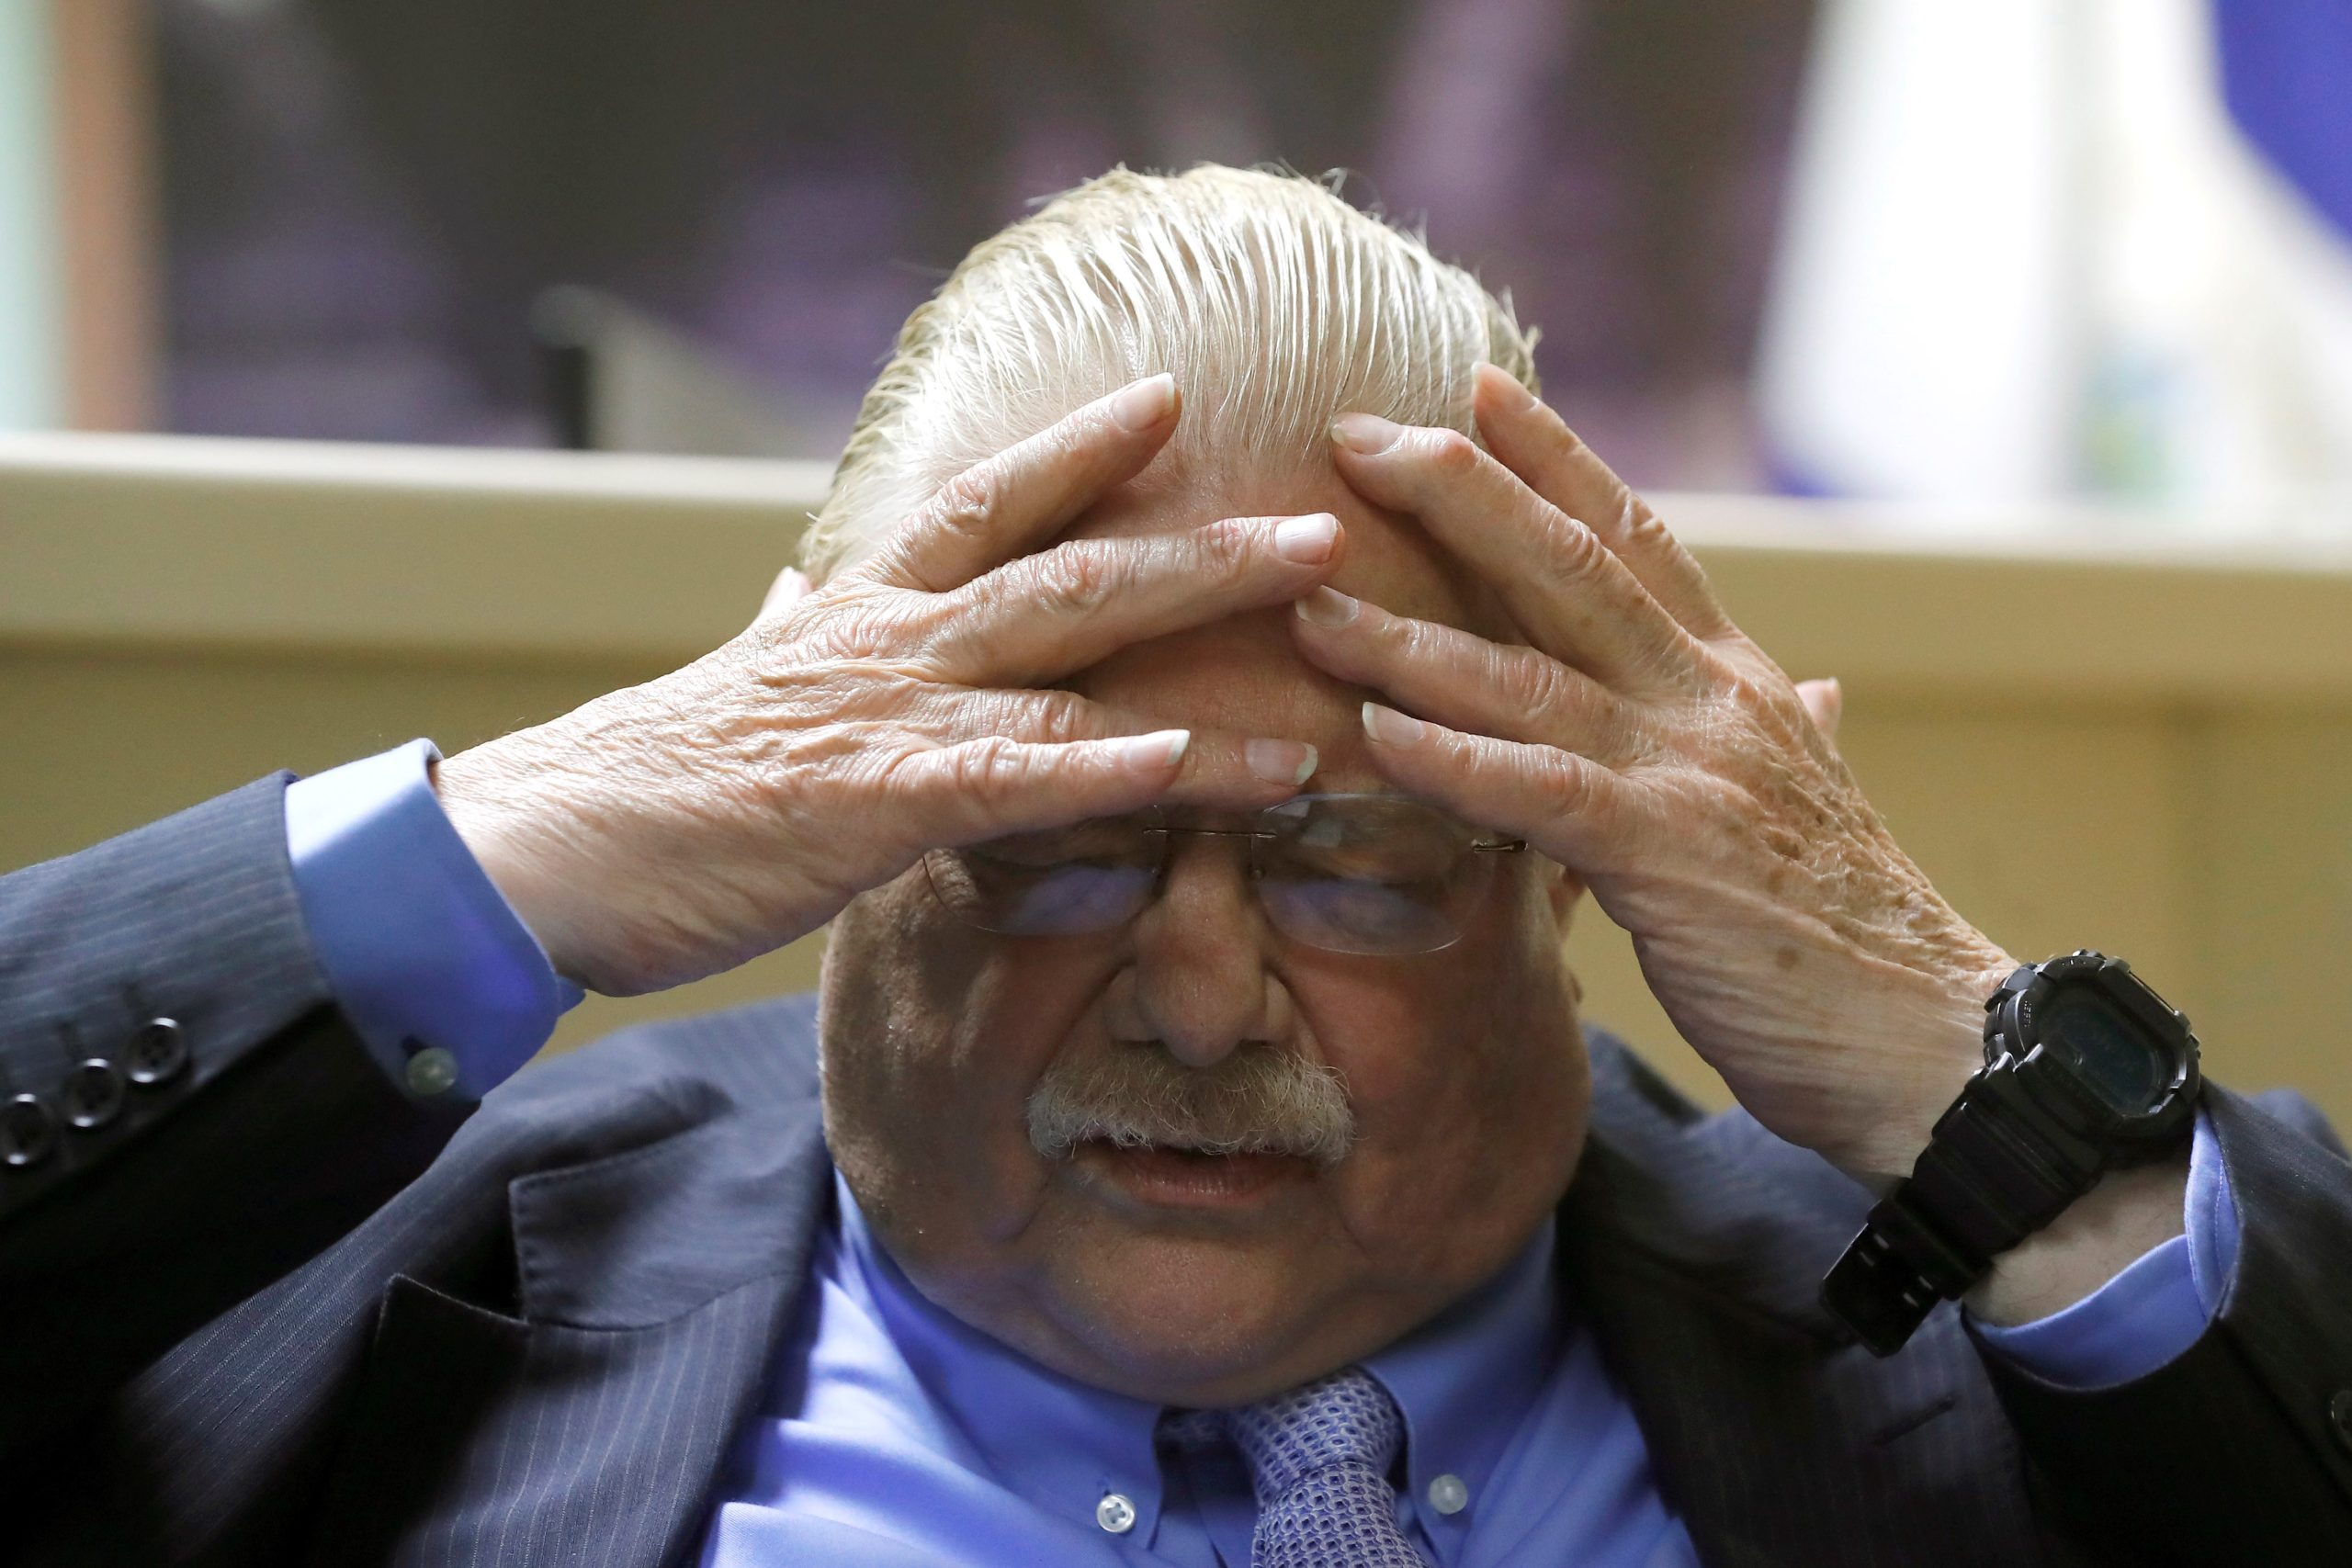 Muere Paul Oquist, mano derecha de Daniel Ortega, con un cuadro clínico de Covid-19